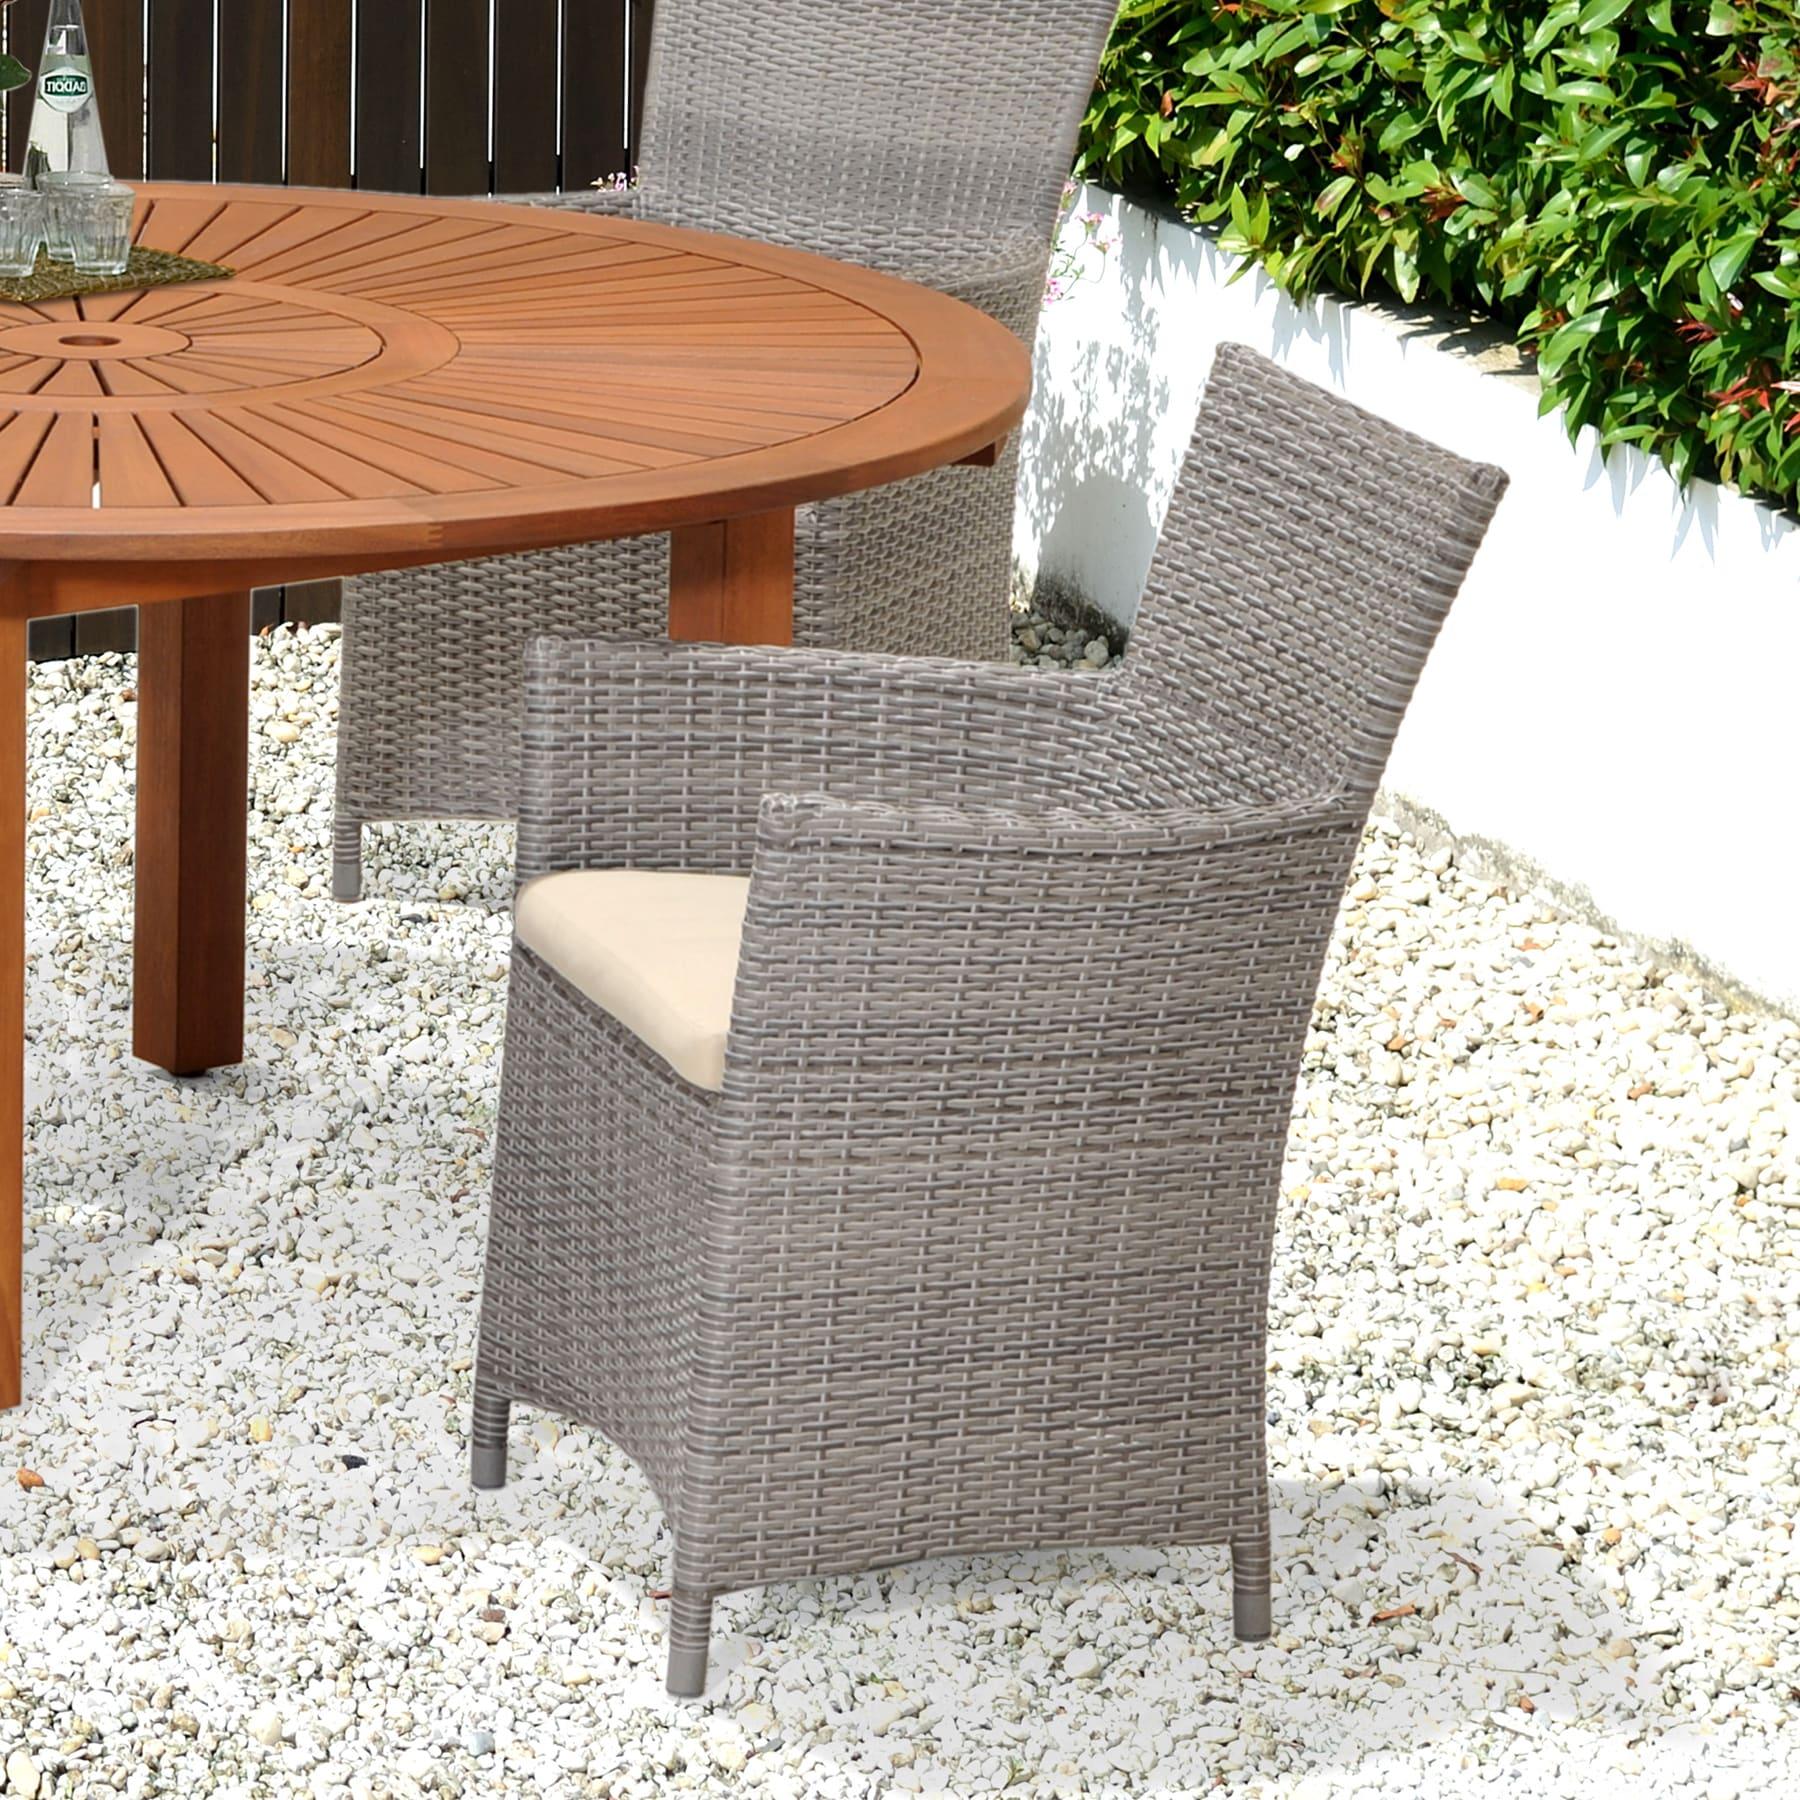 Harper Blvd Brixton Outdoor Easy Chairs 2pc Set (OS4477DO...